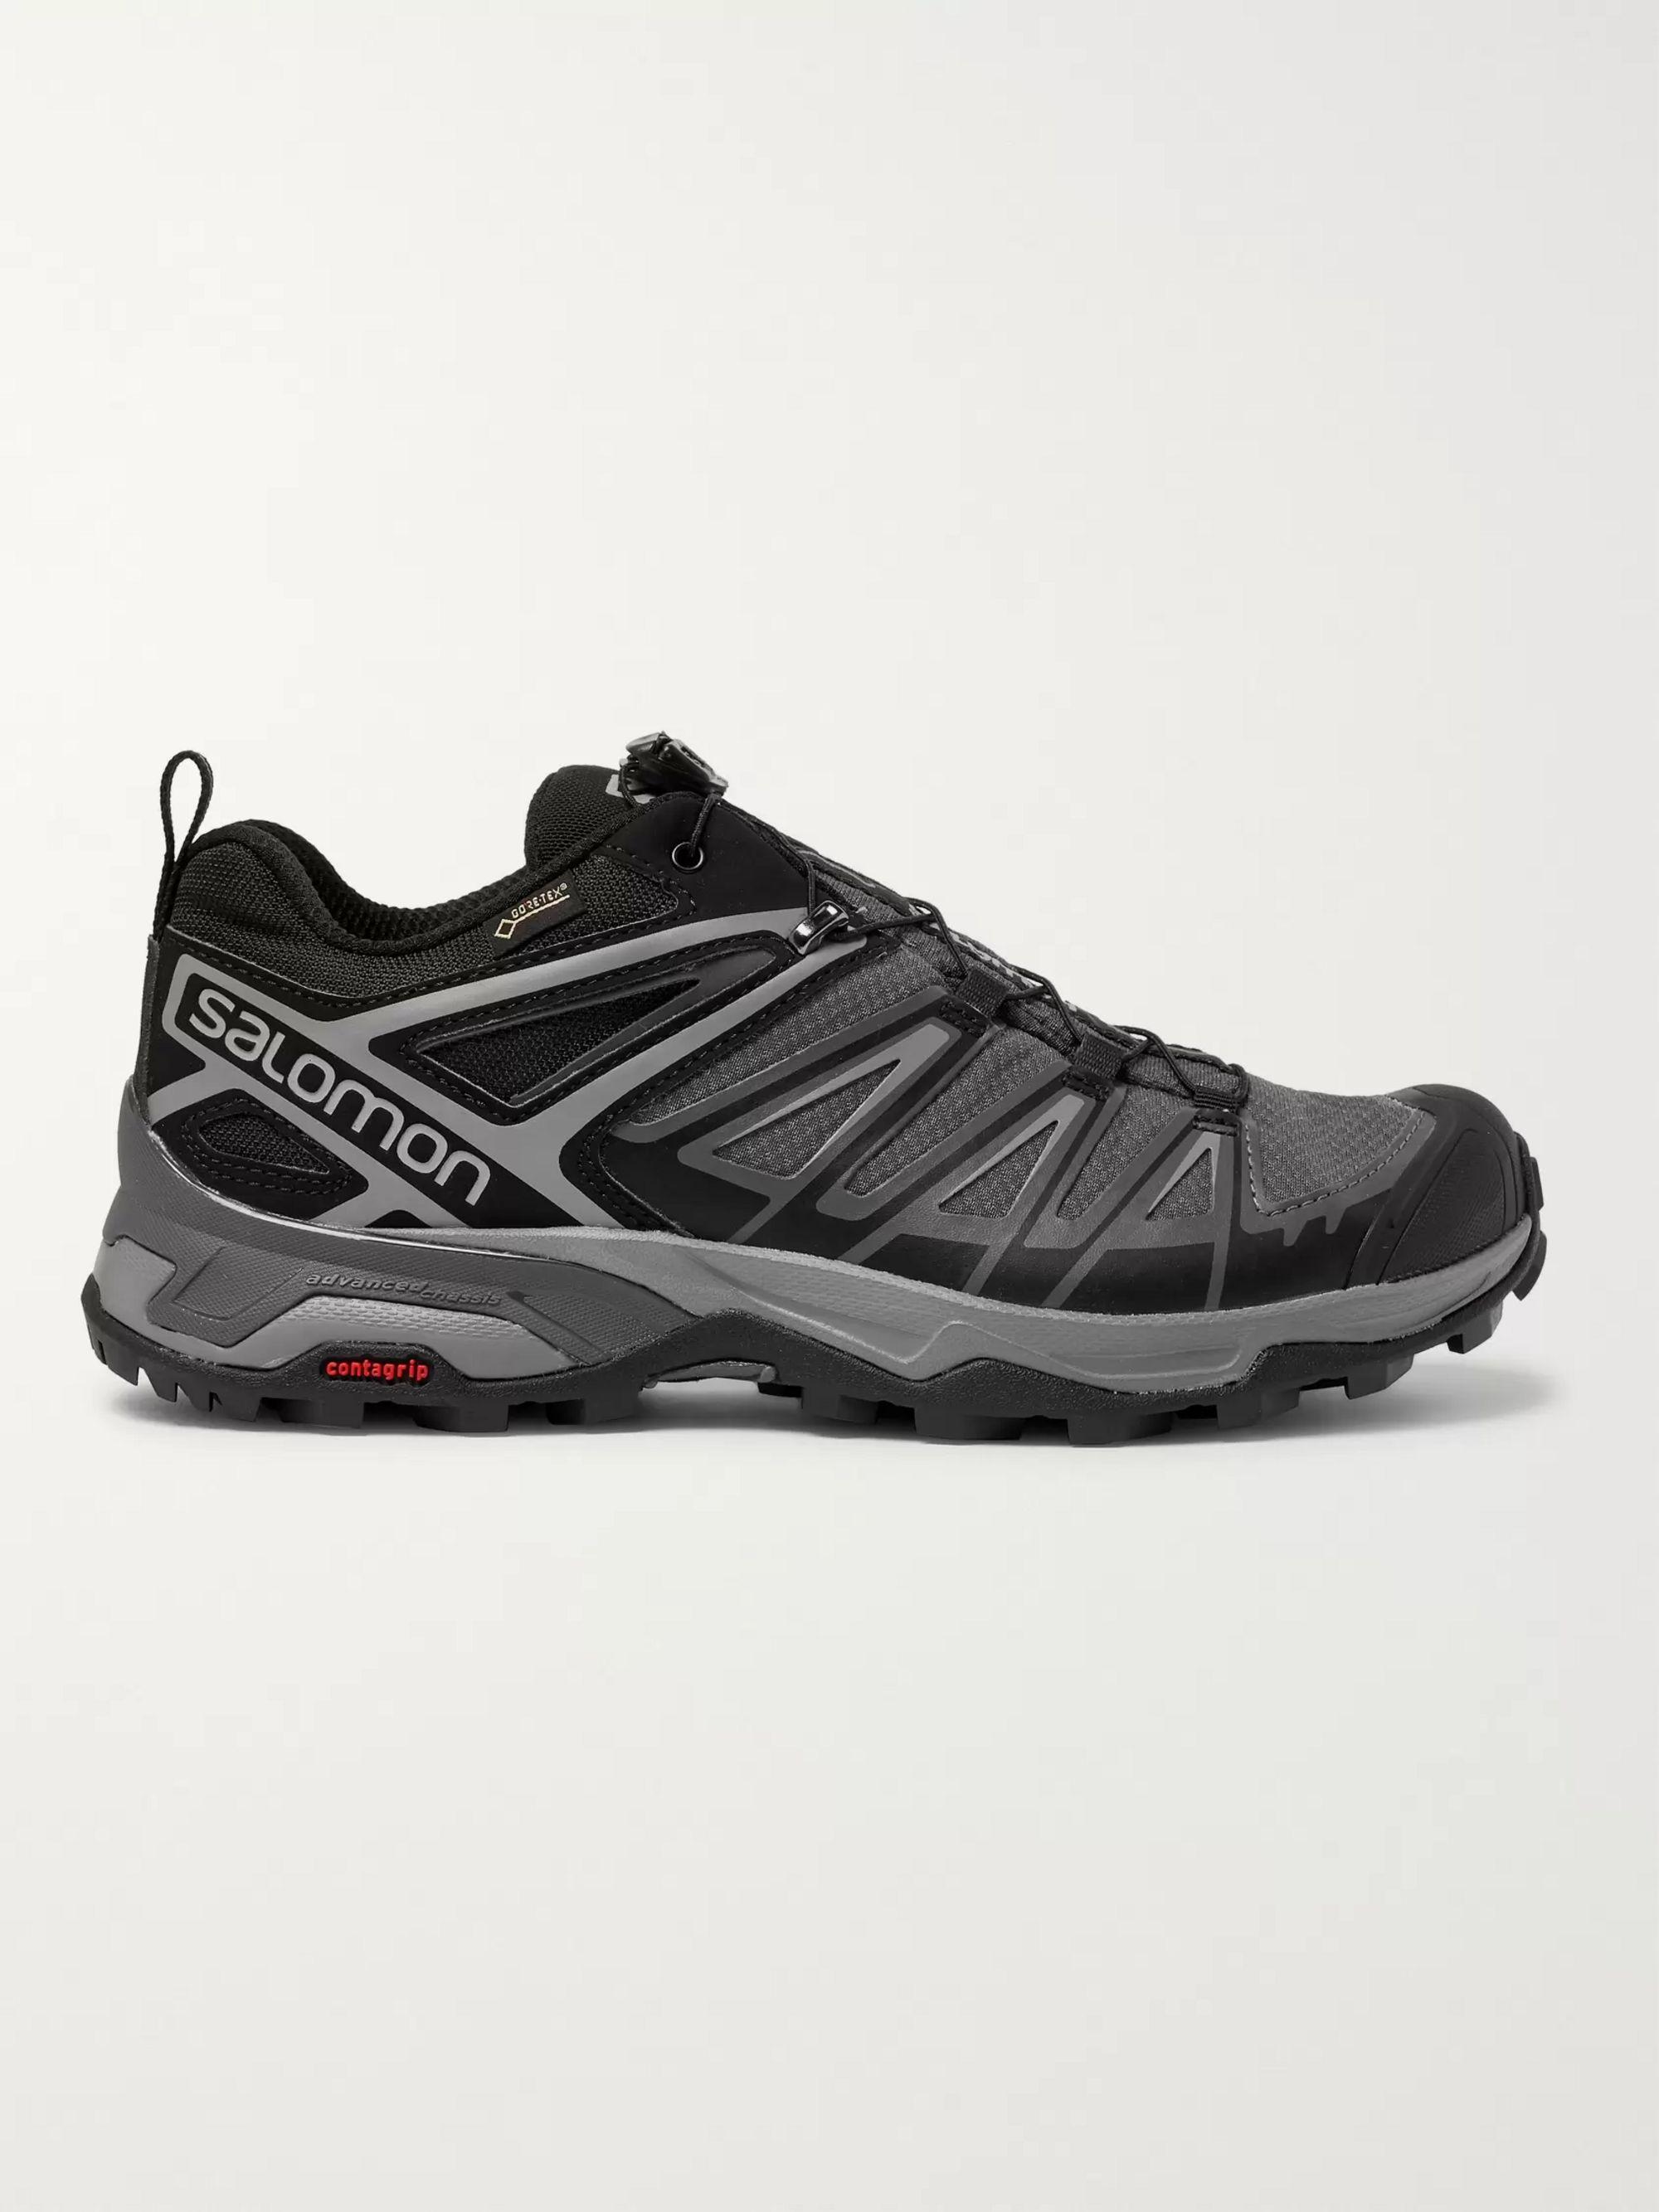 Salomon X Ultra Walking Shoes